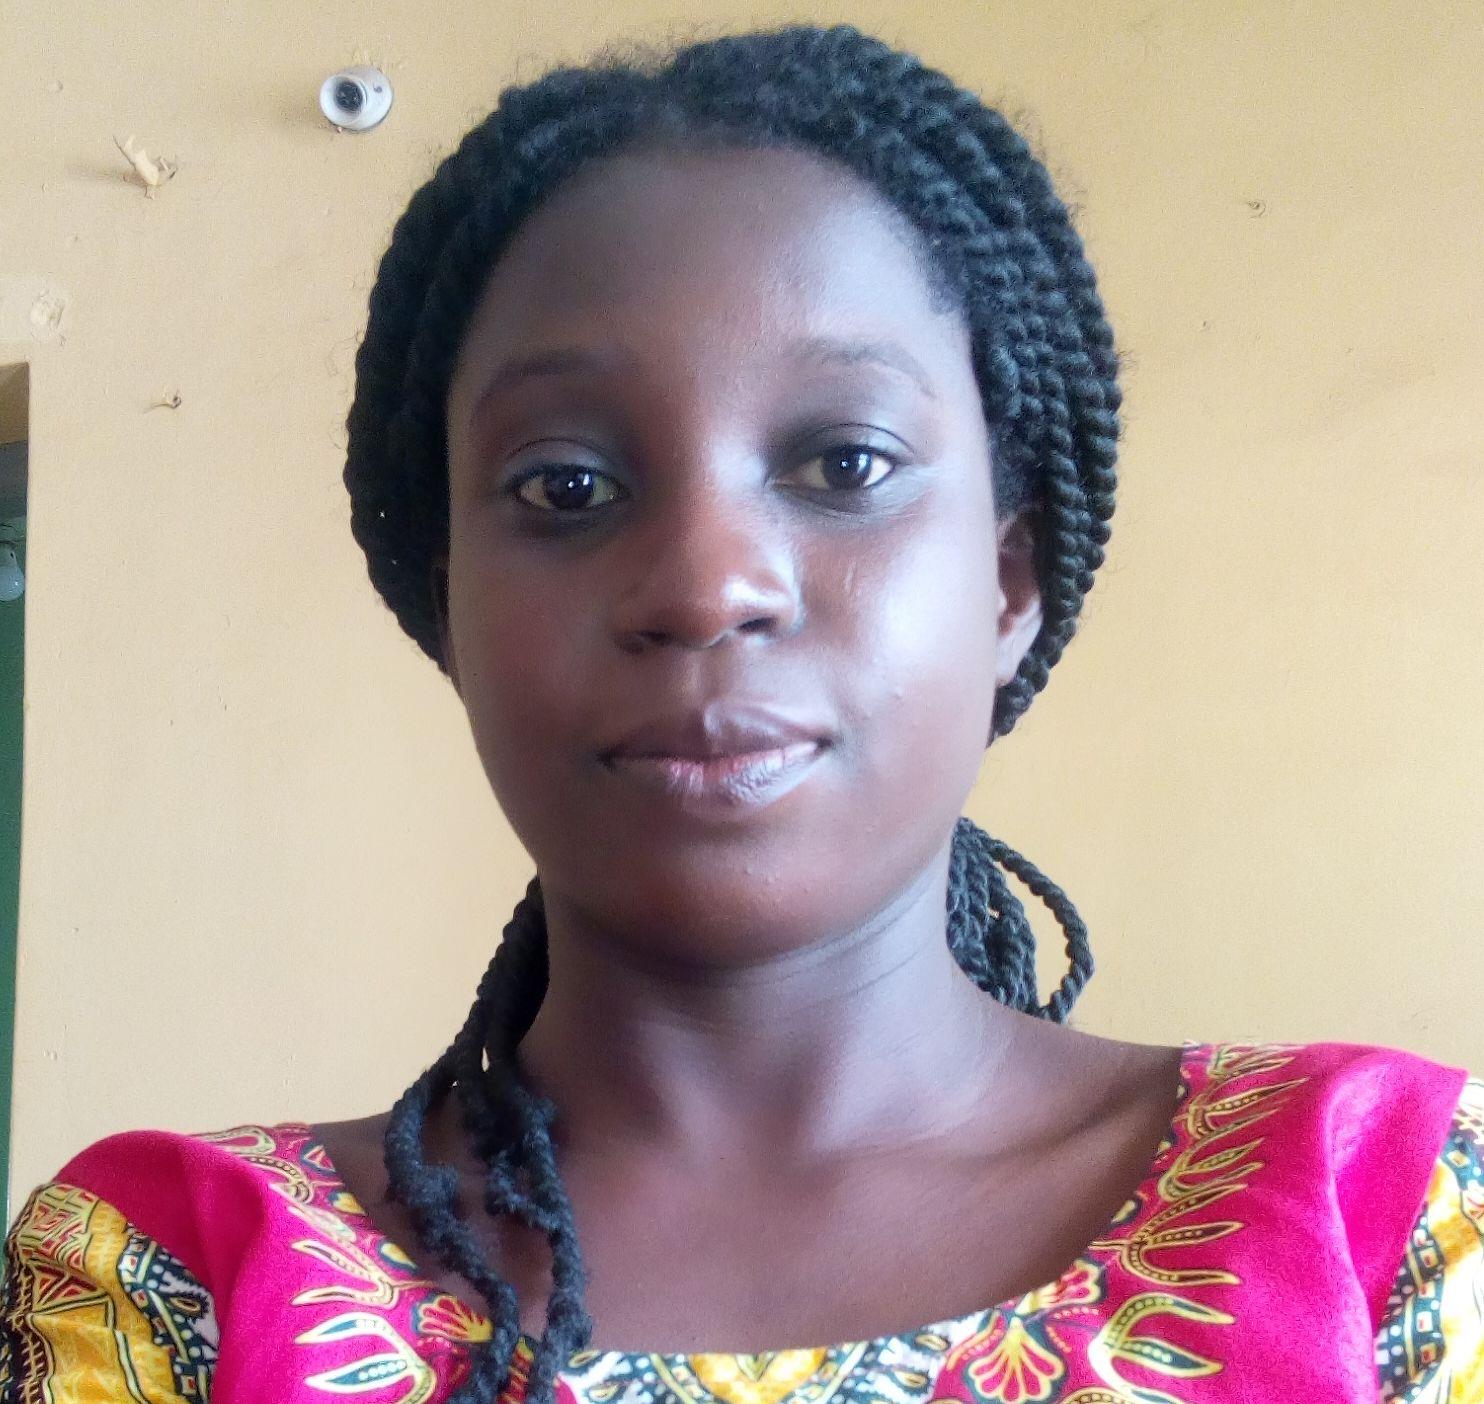 Adeyinka Faith Anuoluwapo